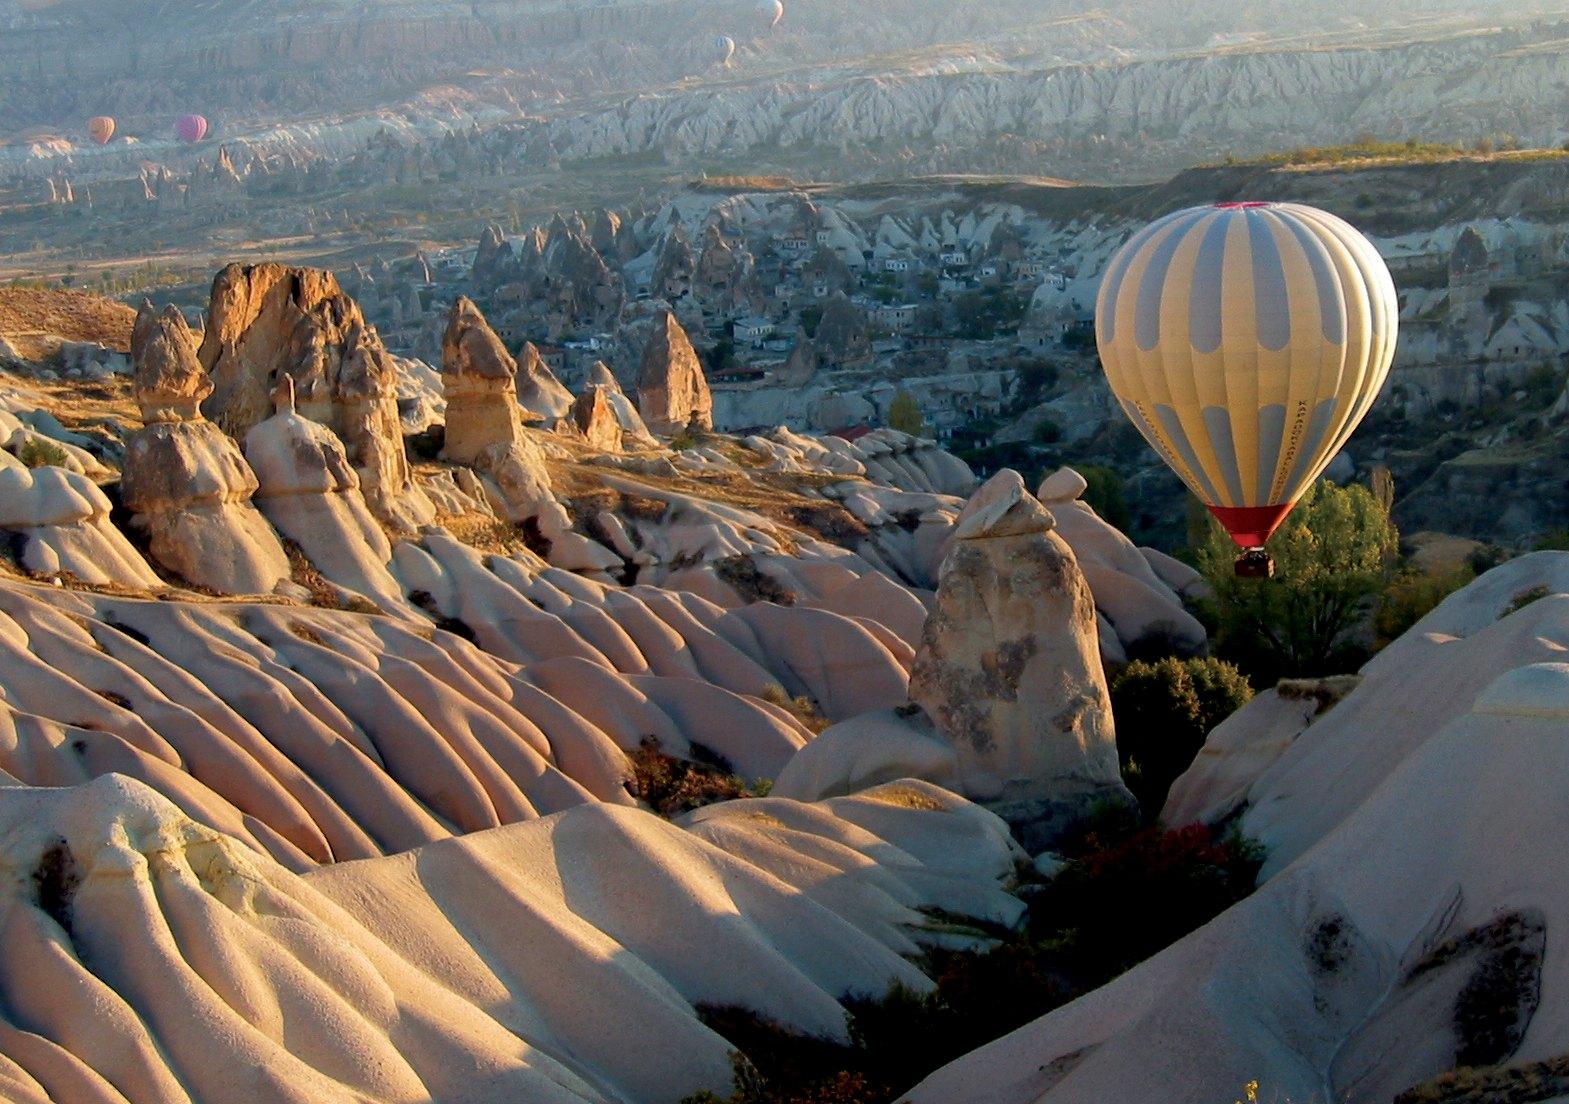 Phoebettmh Travel: (Turkey) – Cappadocia - Land of fairy ...